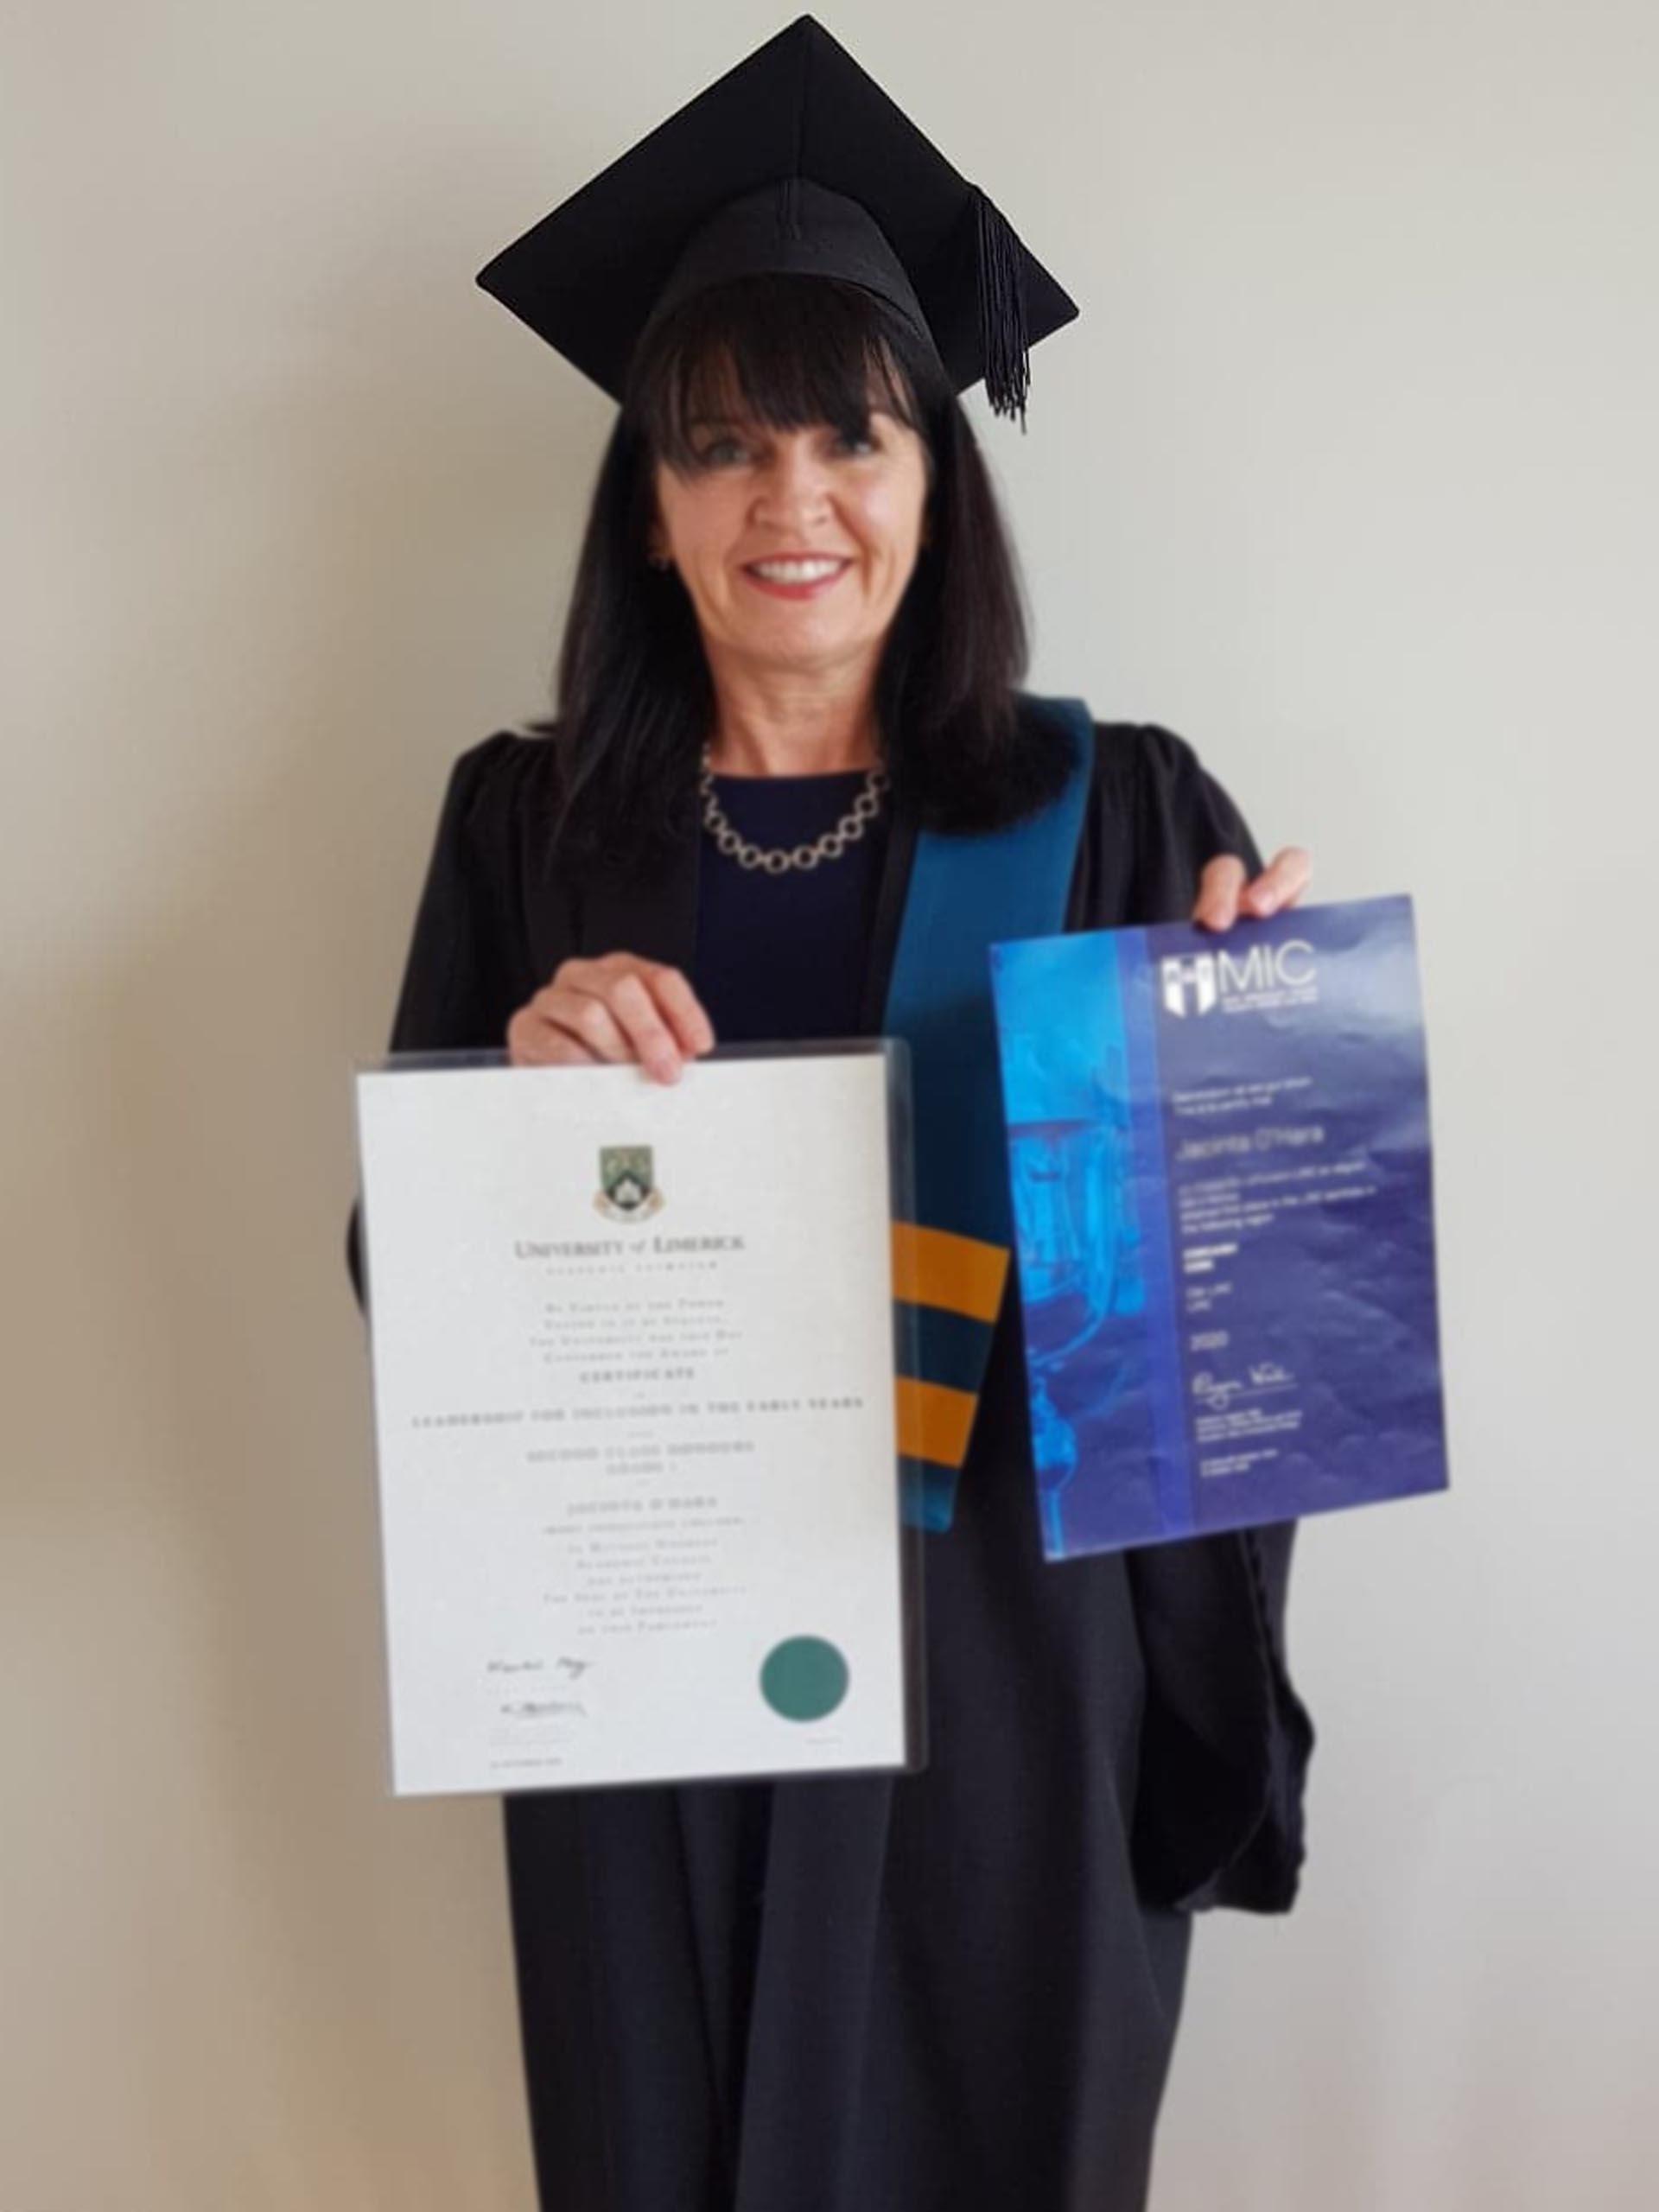 Jacinta O'Hara Ballyheigue, Co. Kerry who won the Early Childhood Ireland Best LINC Portfolio Award